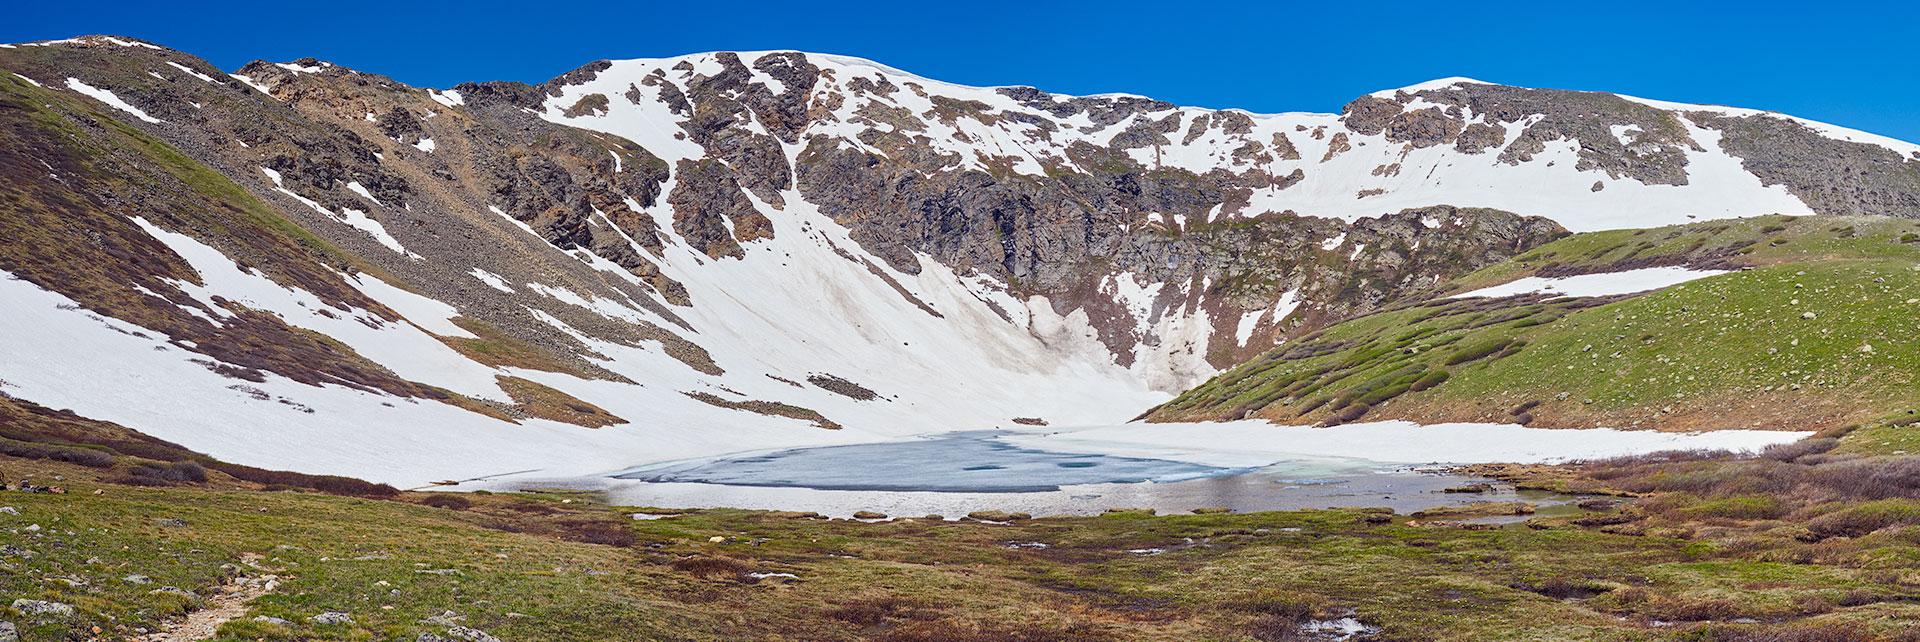 Shelf Lake. Elevation 12,100 feet.